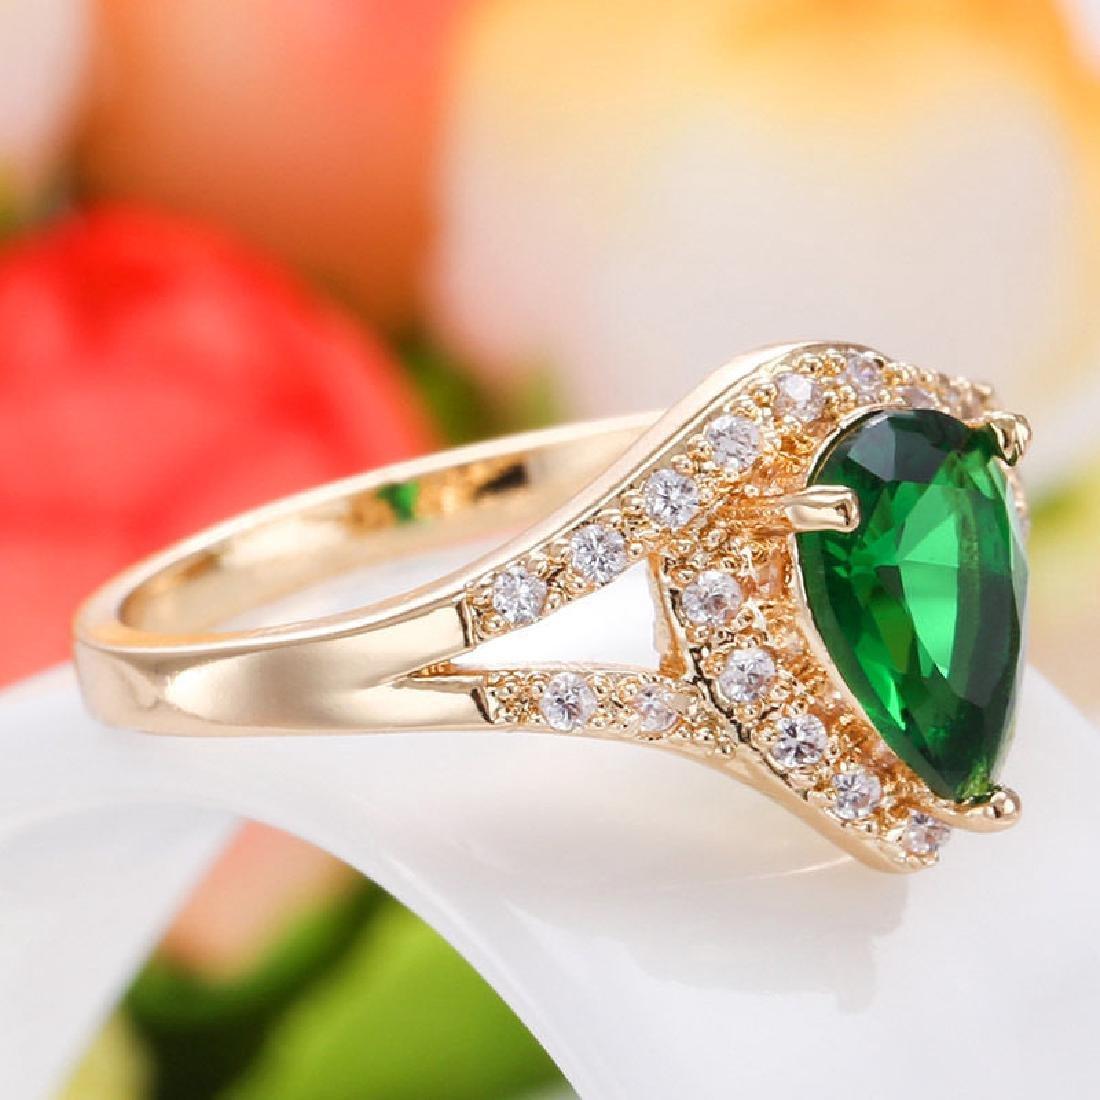 Women 14K Yellow GF 2.79ct Emerald Ring Wedding - 2